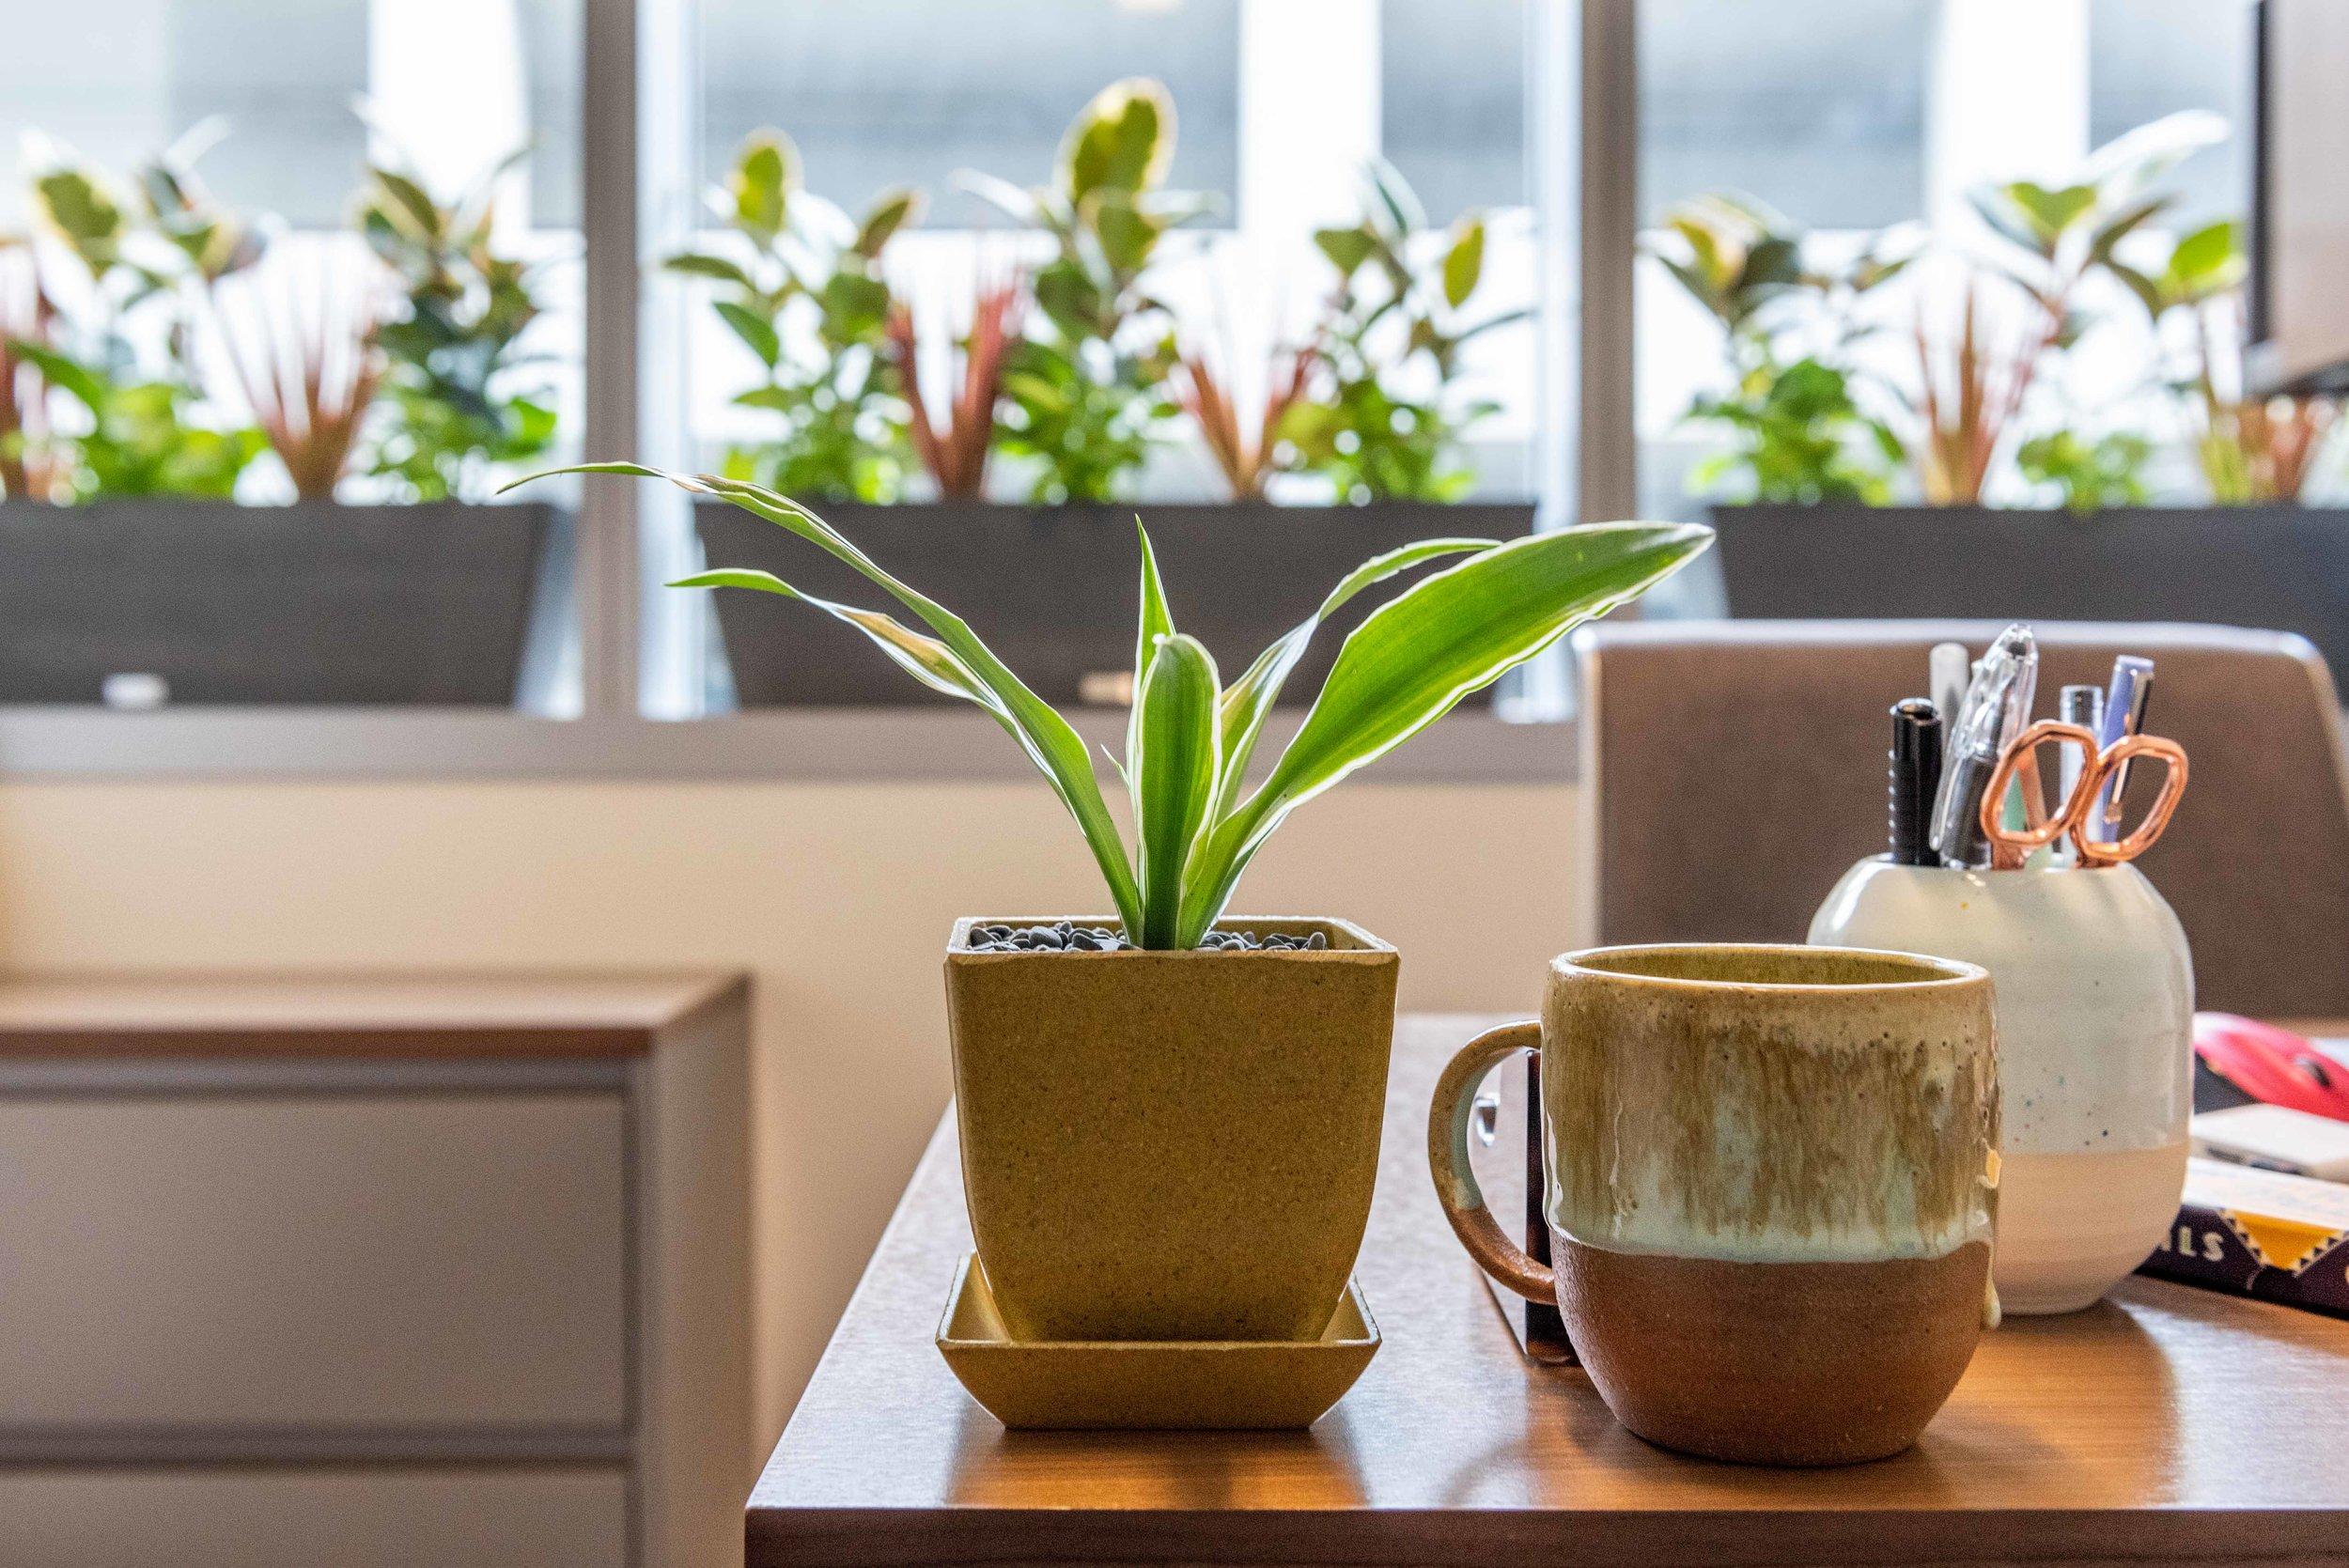 interior_plants-17.jpg